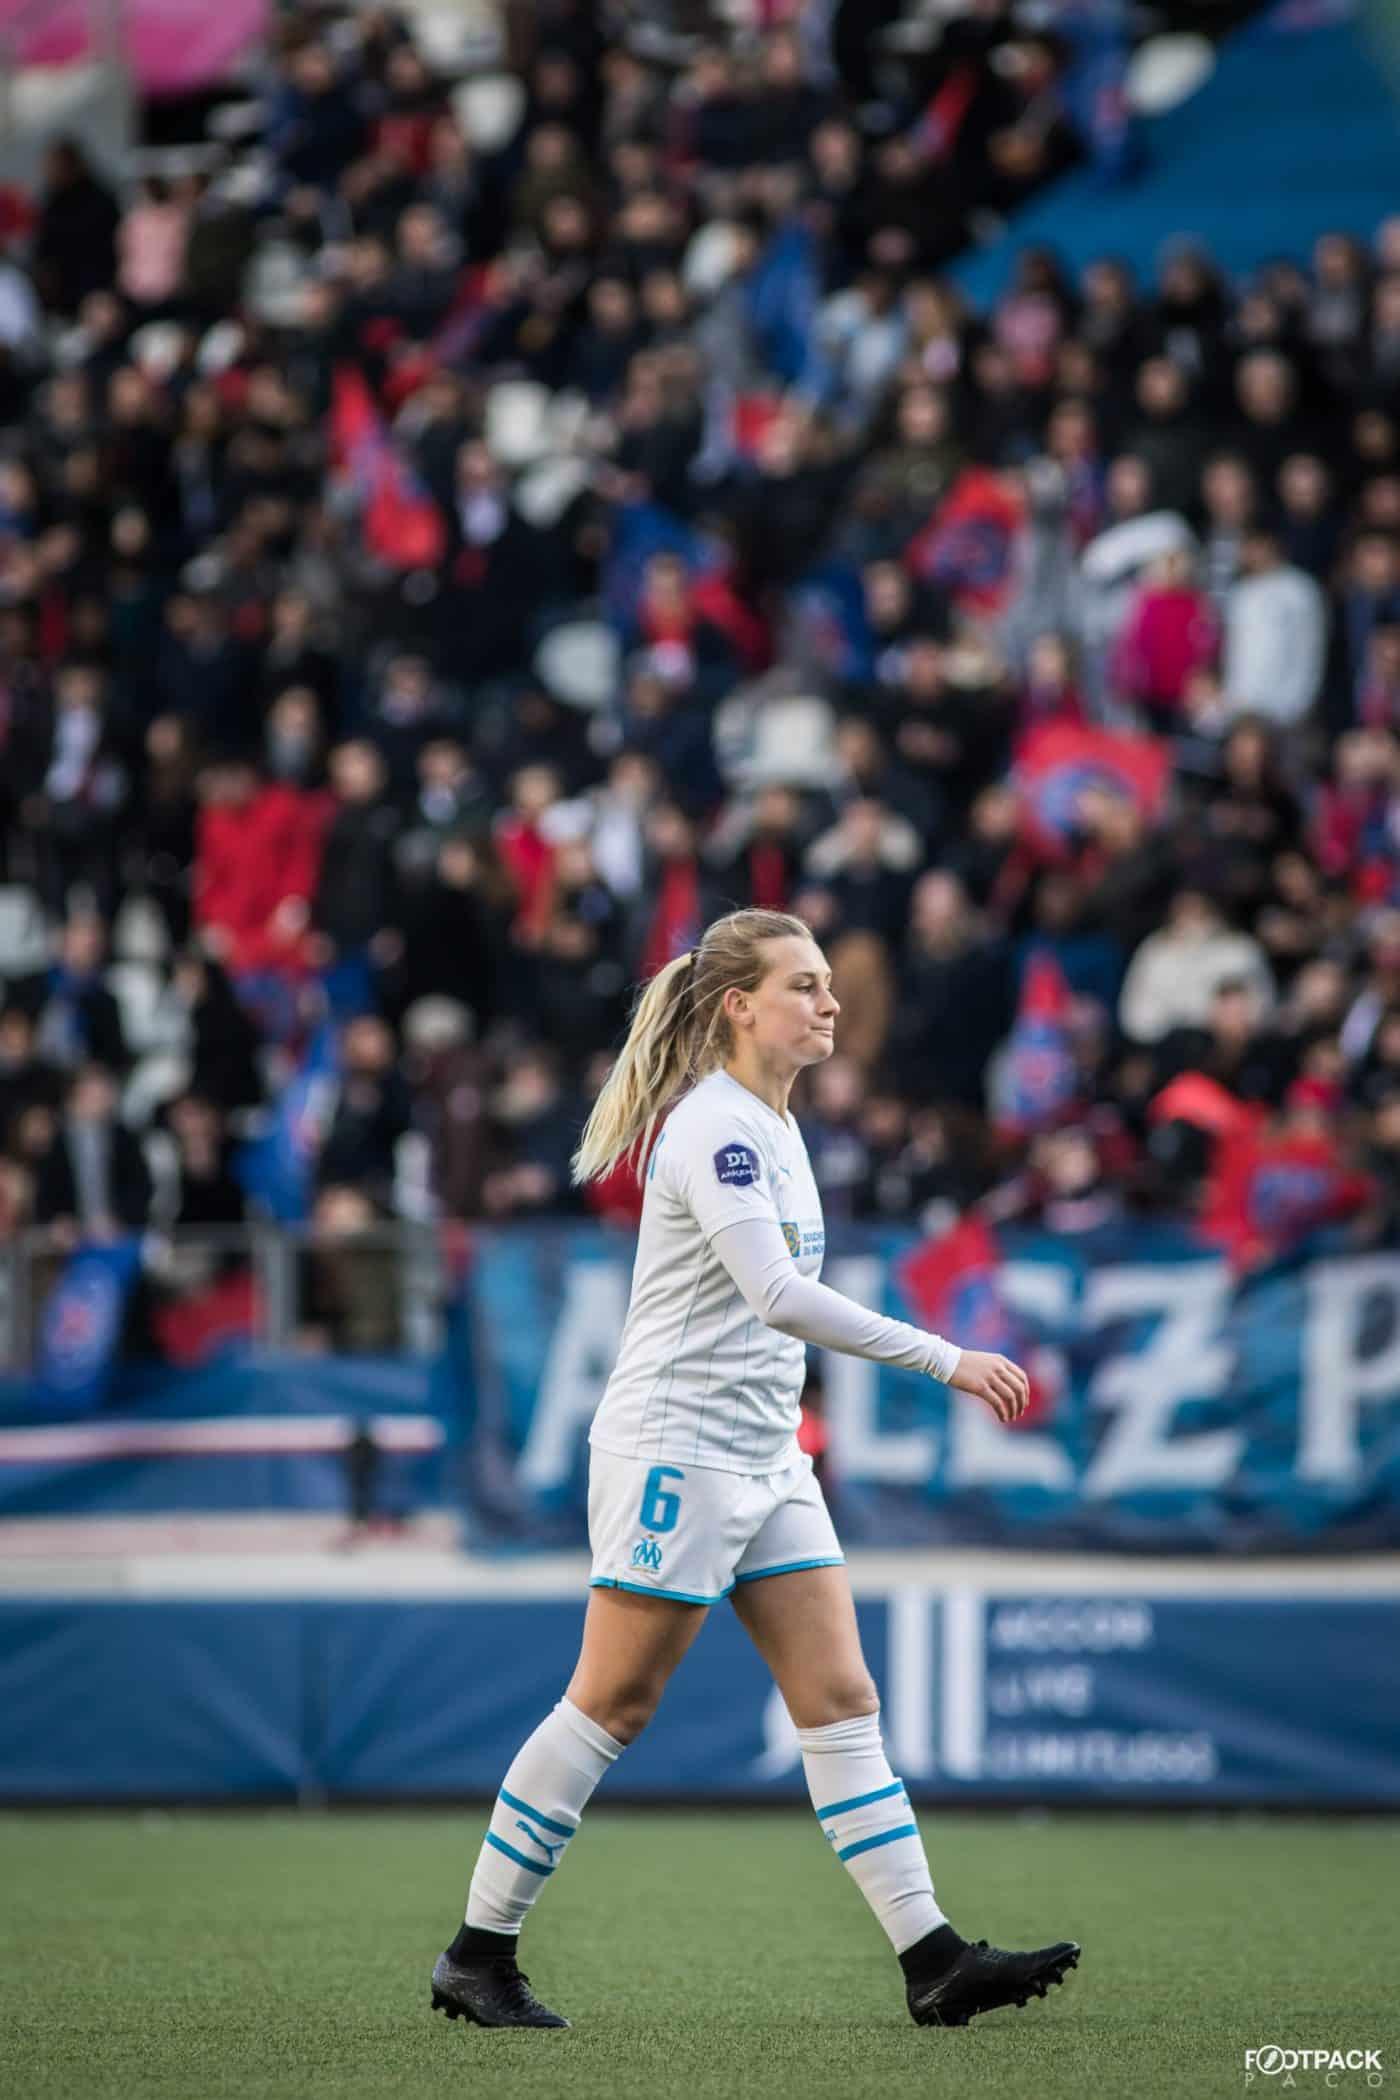 au-stade-paris-saint-germain-psg-olympique-de-marseille-d1-feminine-arkema-footpack-14